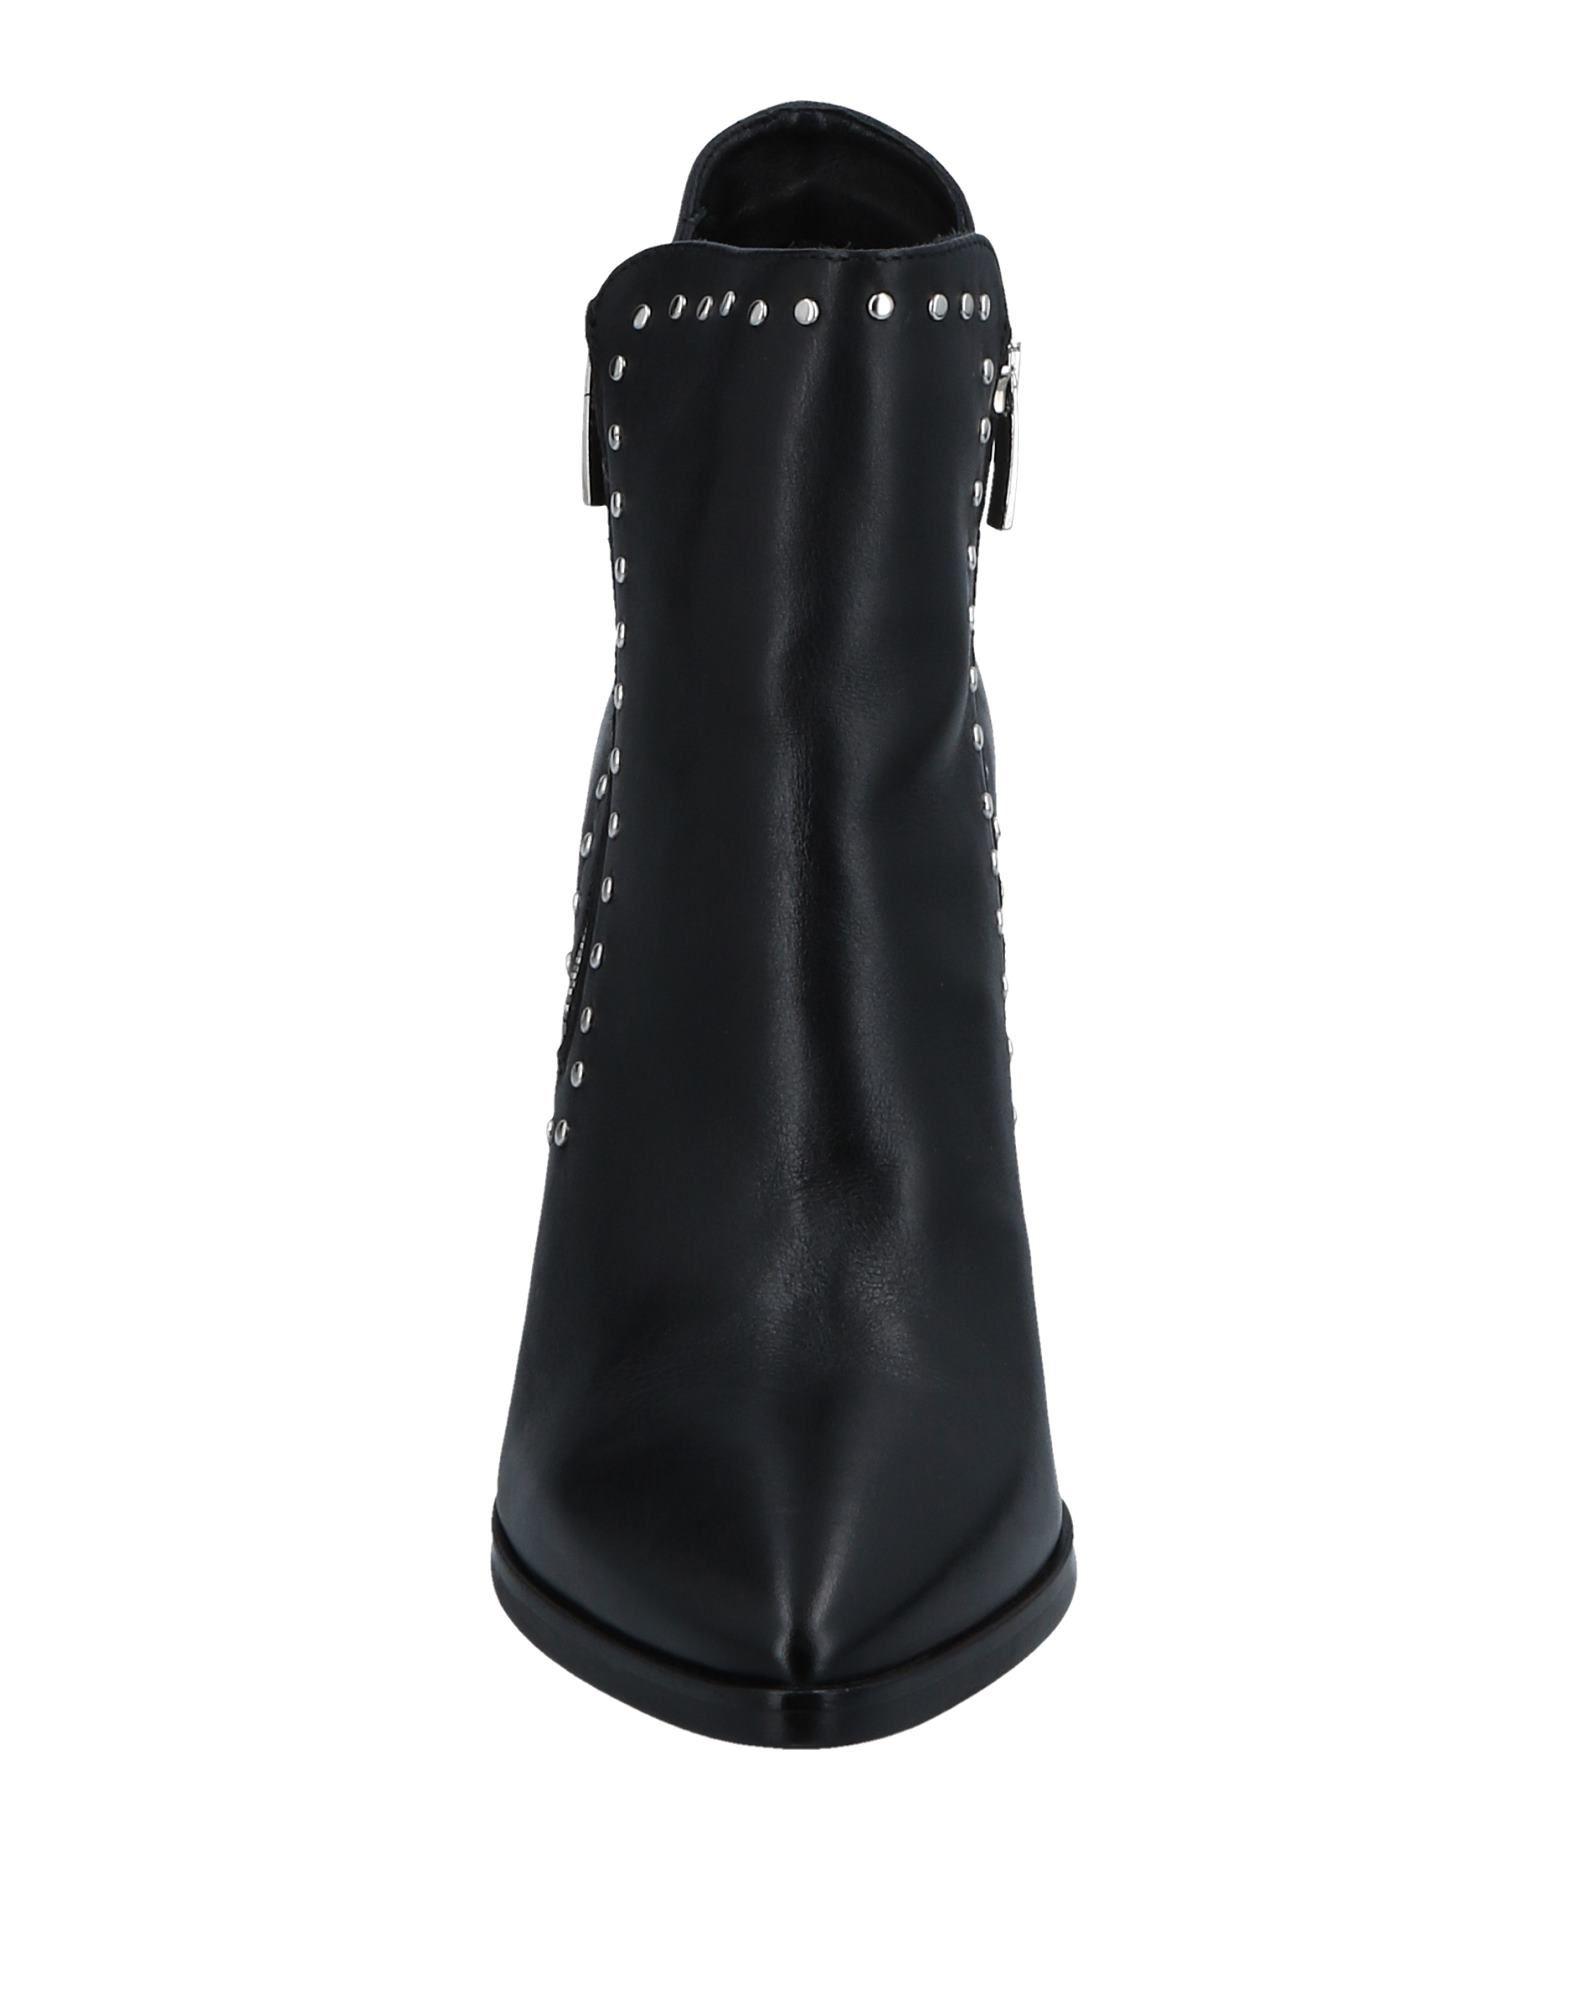 Stilvolle Janet billige Schuhe Janet & Janet Stilvolle Stiefelette Damen  11505474IP 1144d4